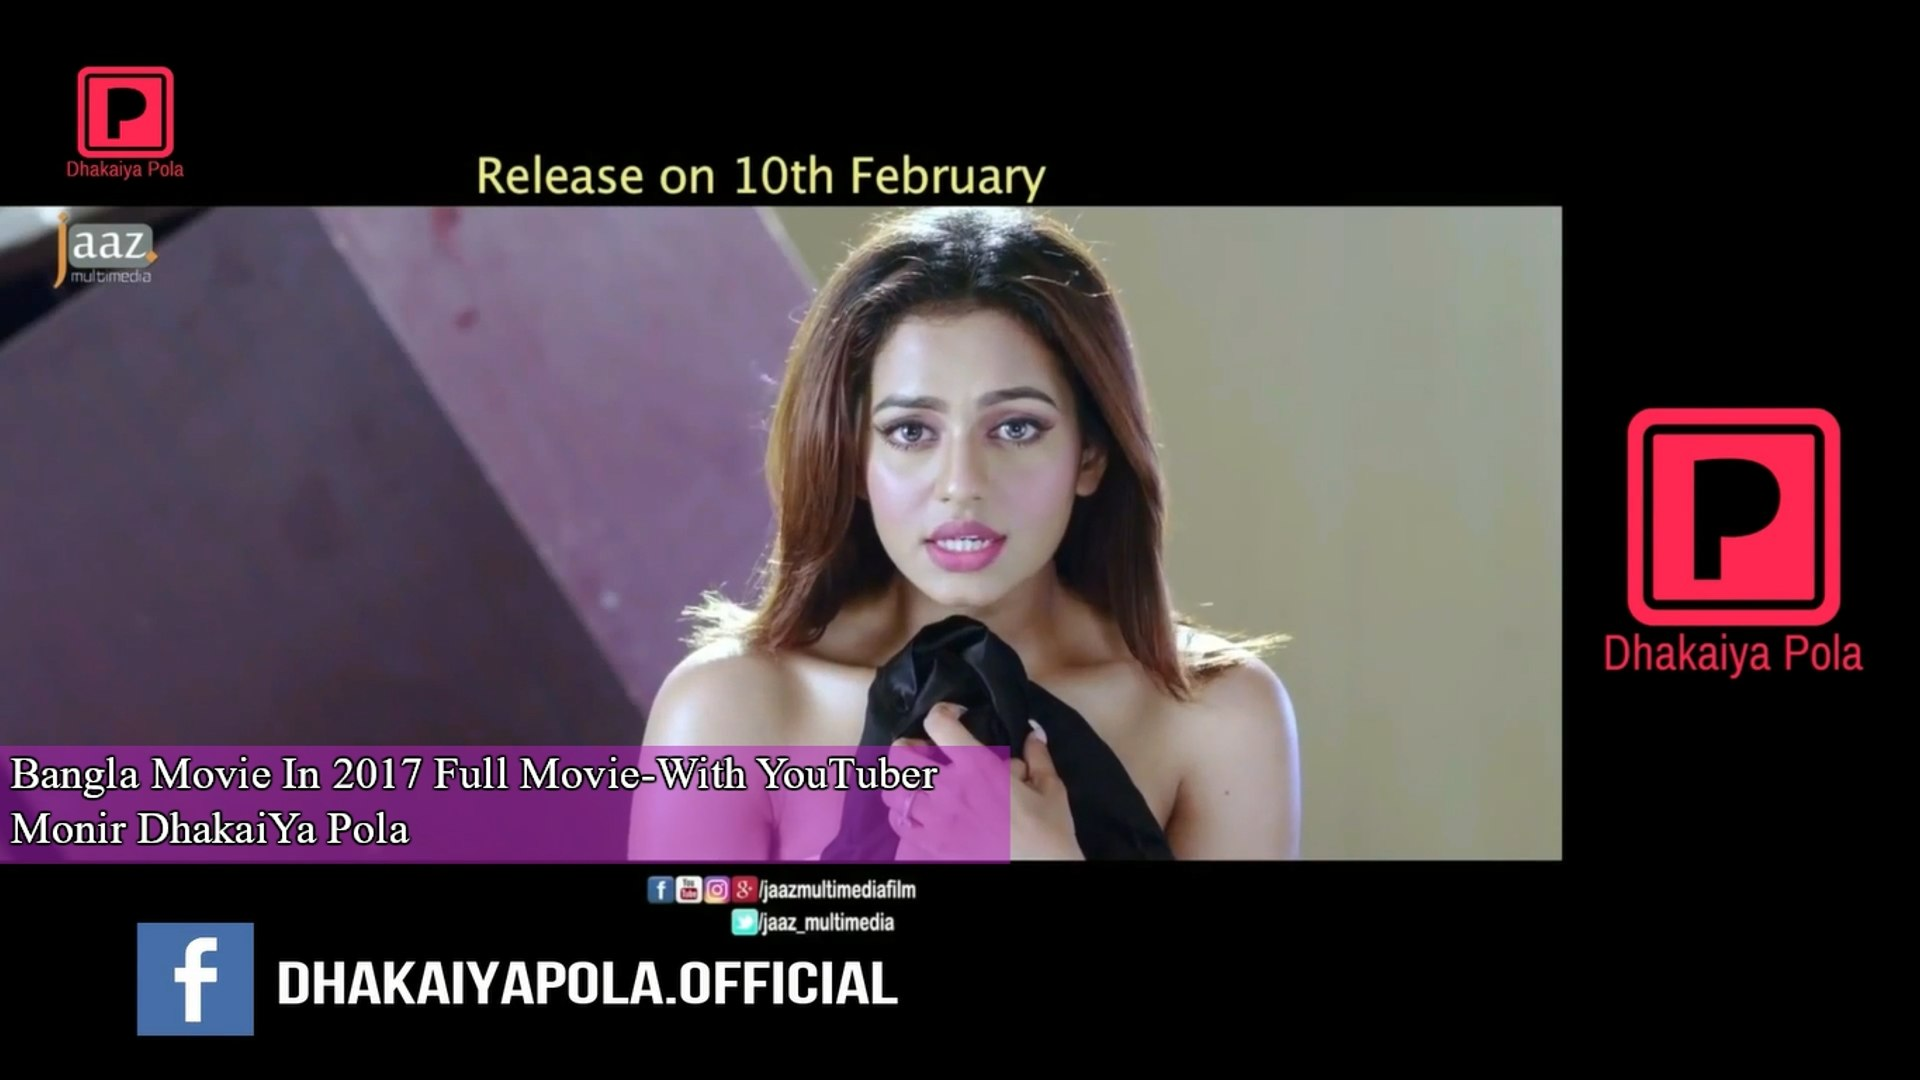 Top 5 Bangla Movie In 2017 Full Movie-With YouTuber Monir DhakaiYa Pola MonirTalks Show